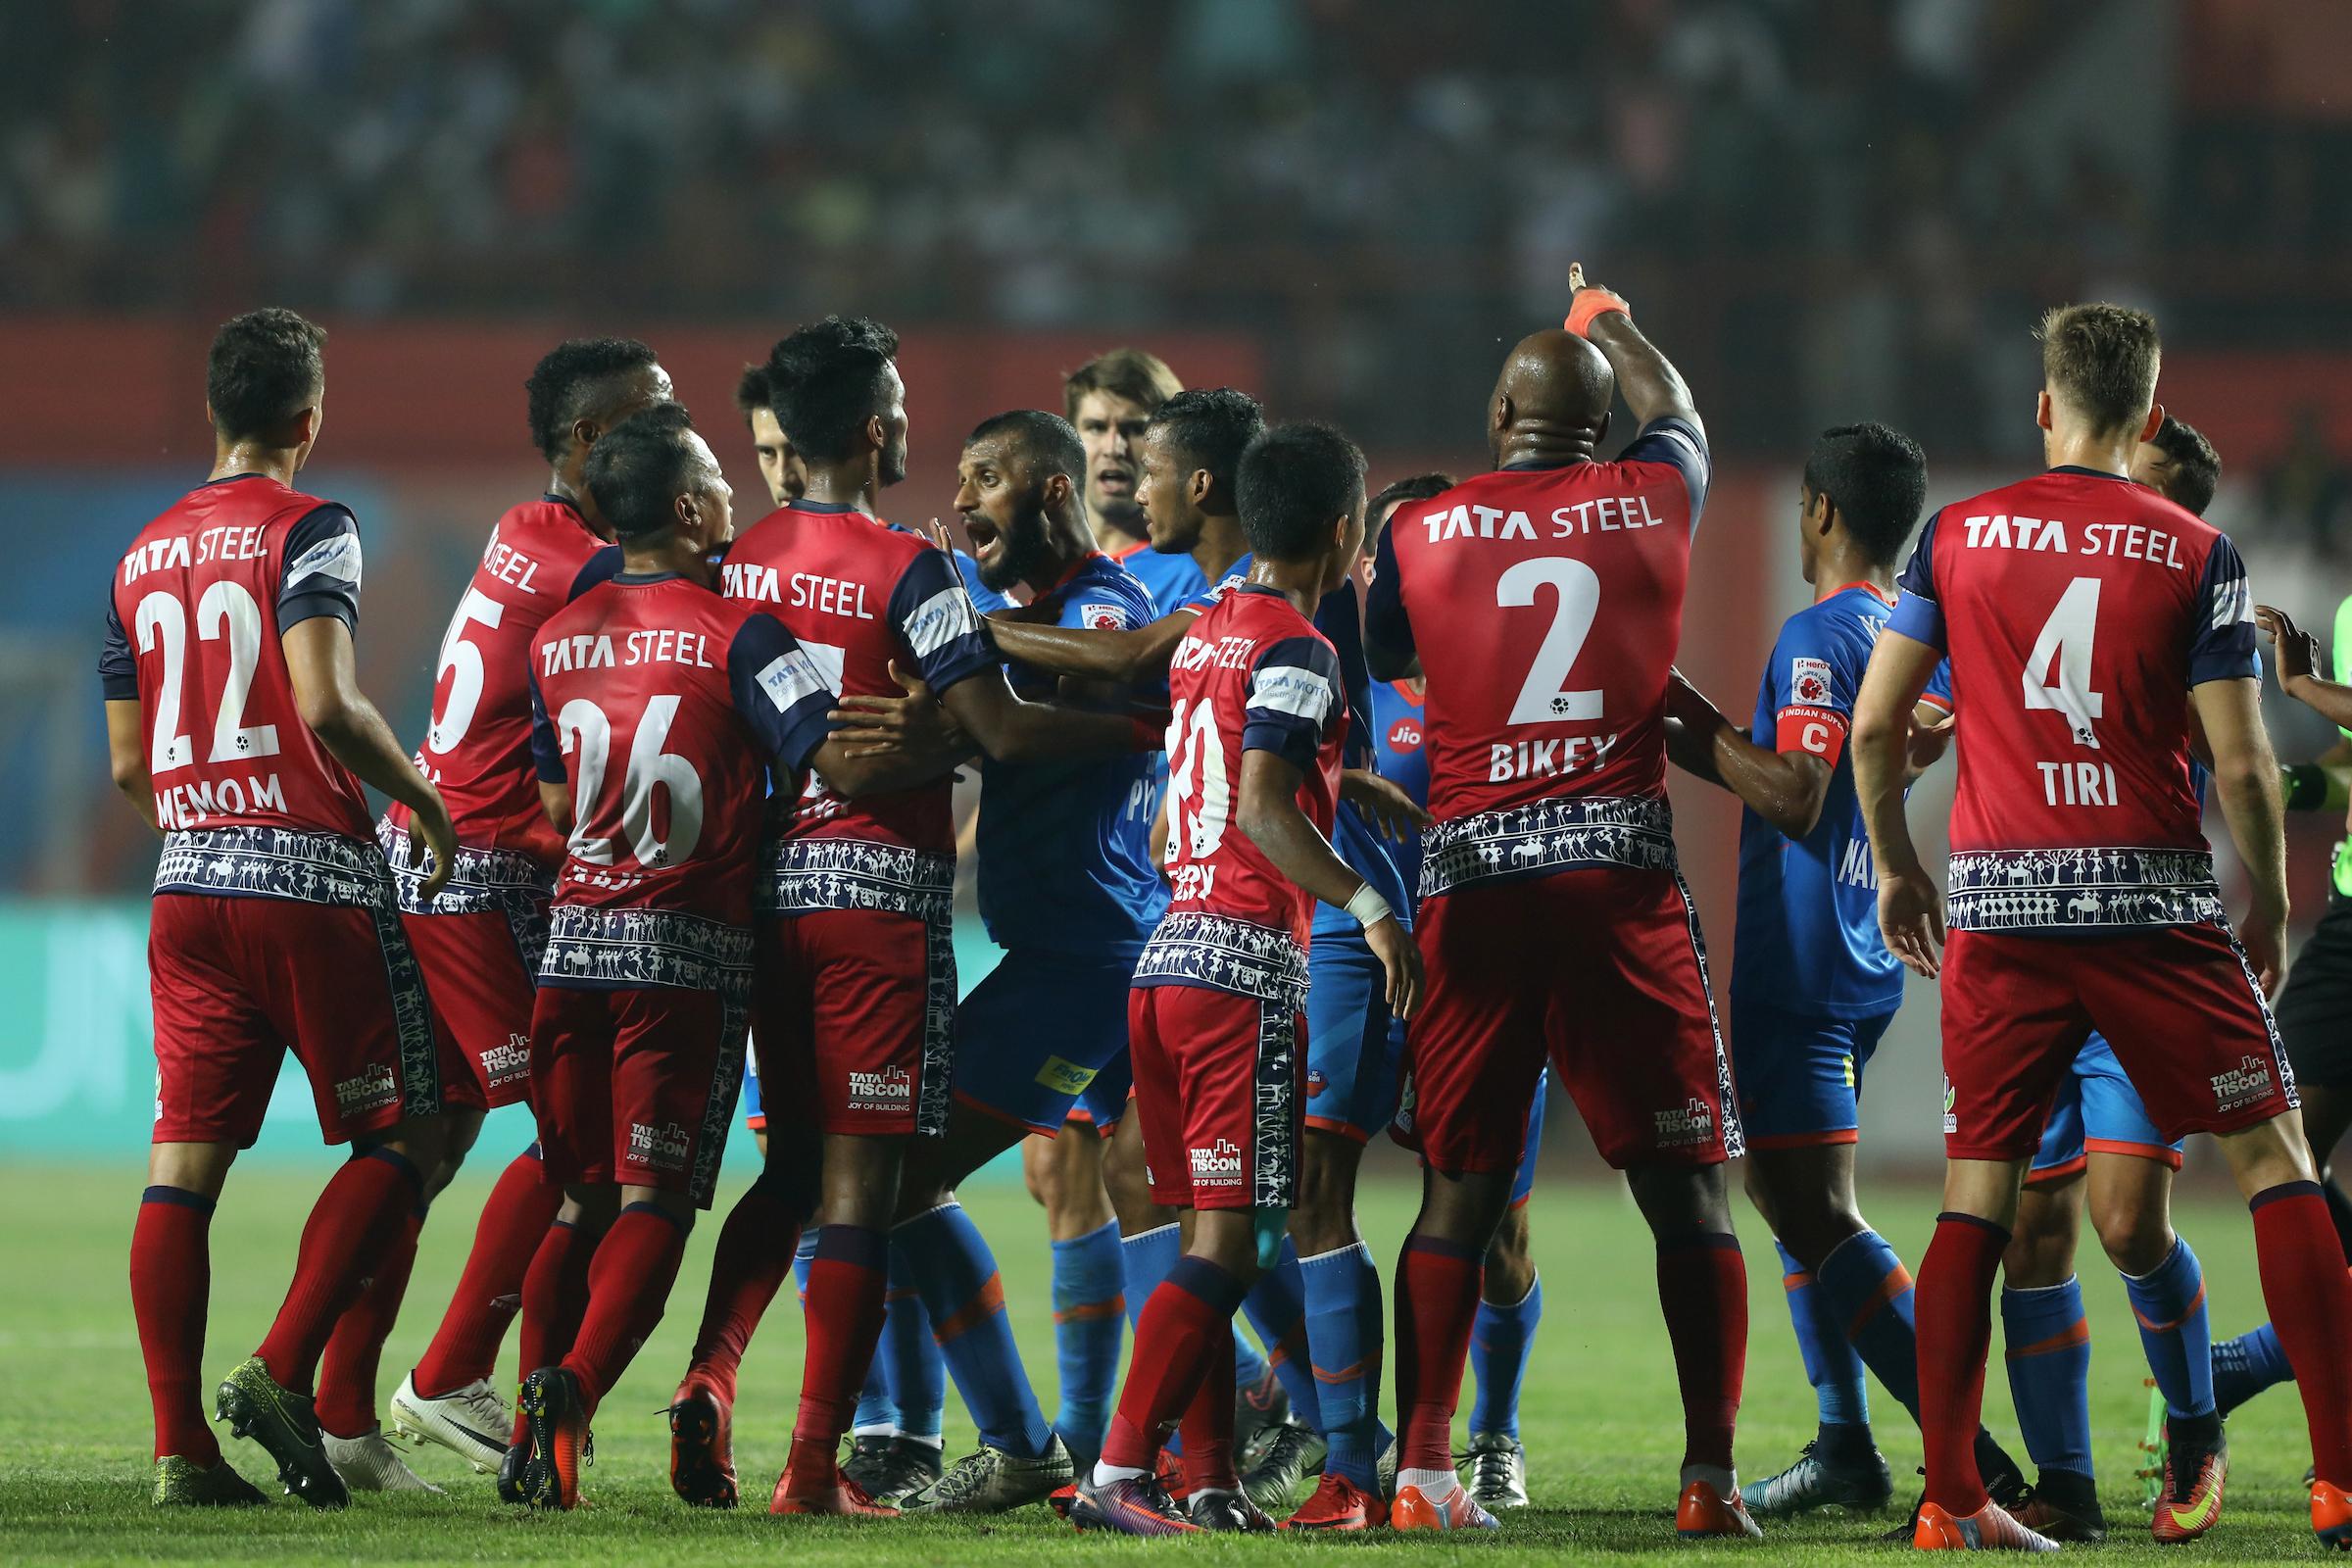 FC Goa vs Jamshedpur fight among players